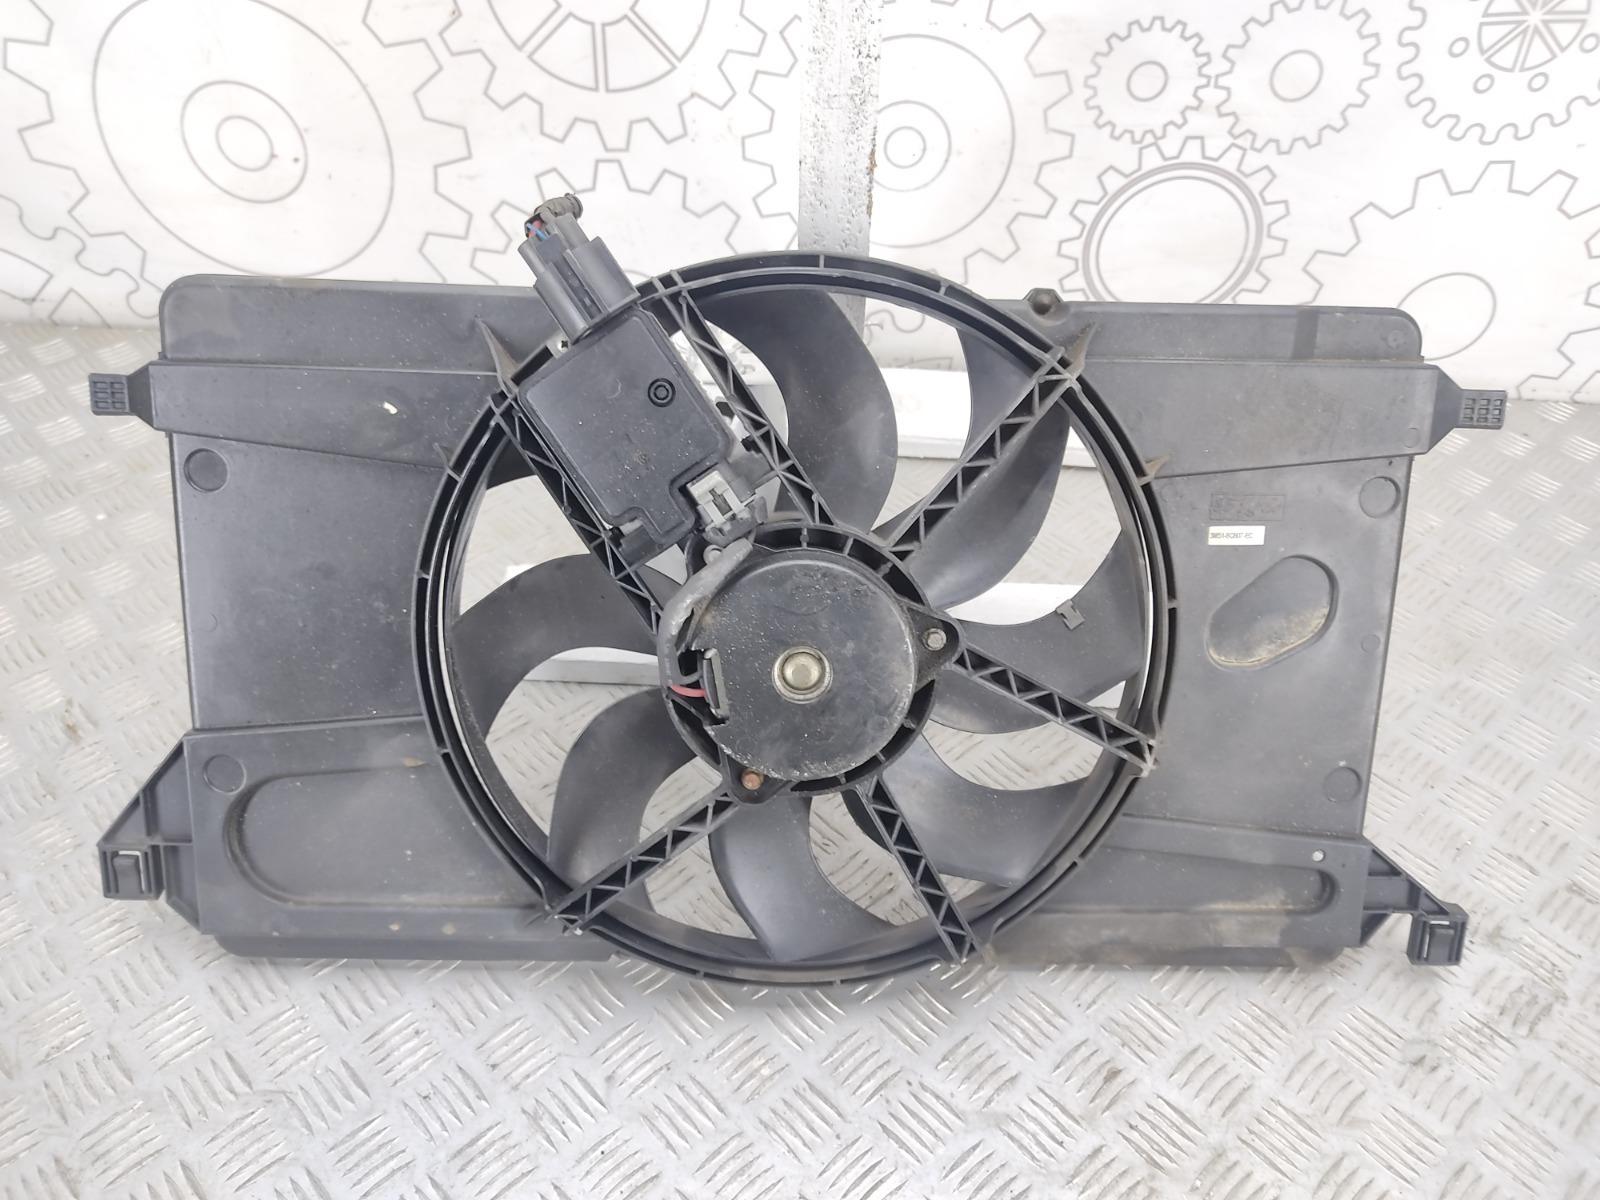 Вентилятор радиатора Ford Focus 1.6 I 2008 (б/у)